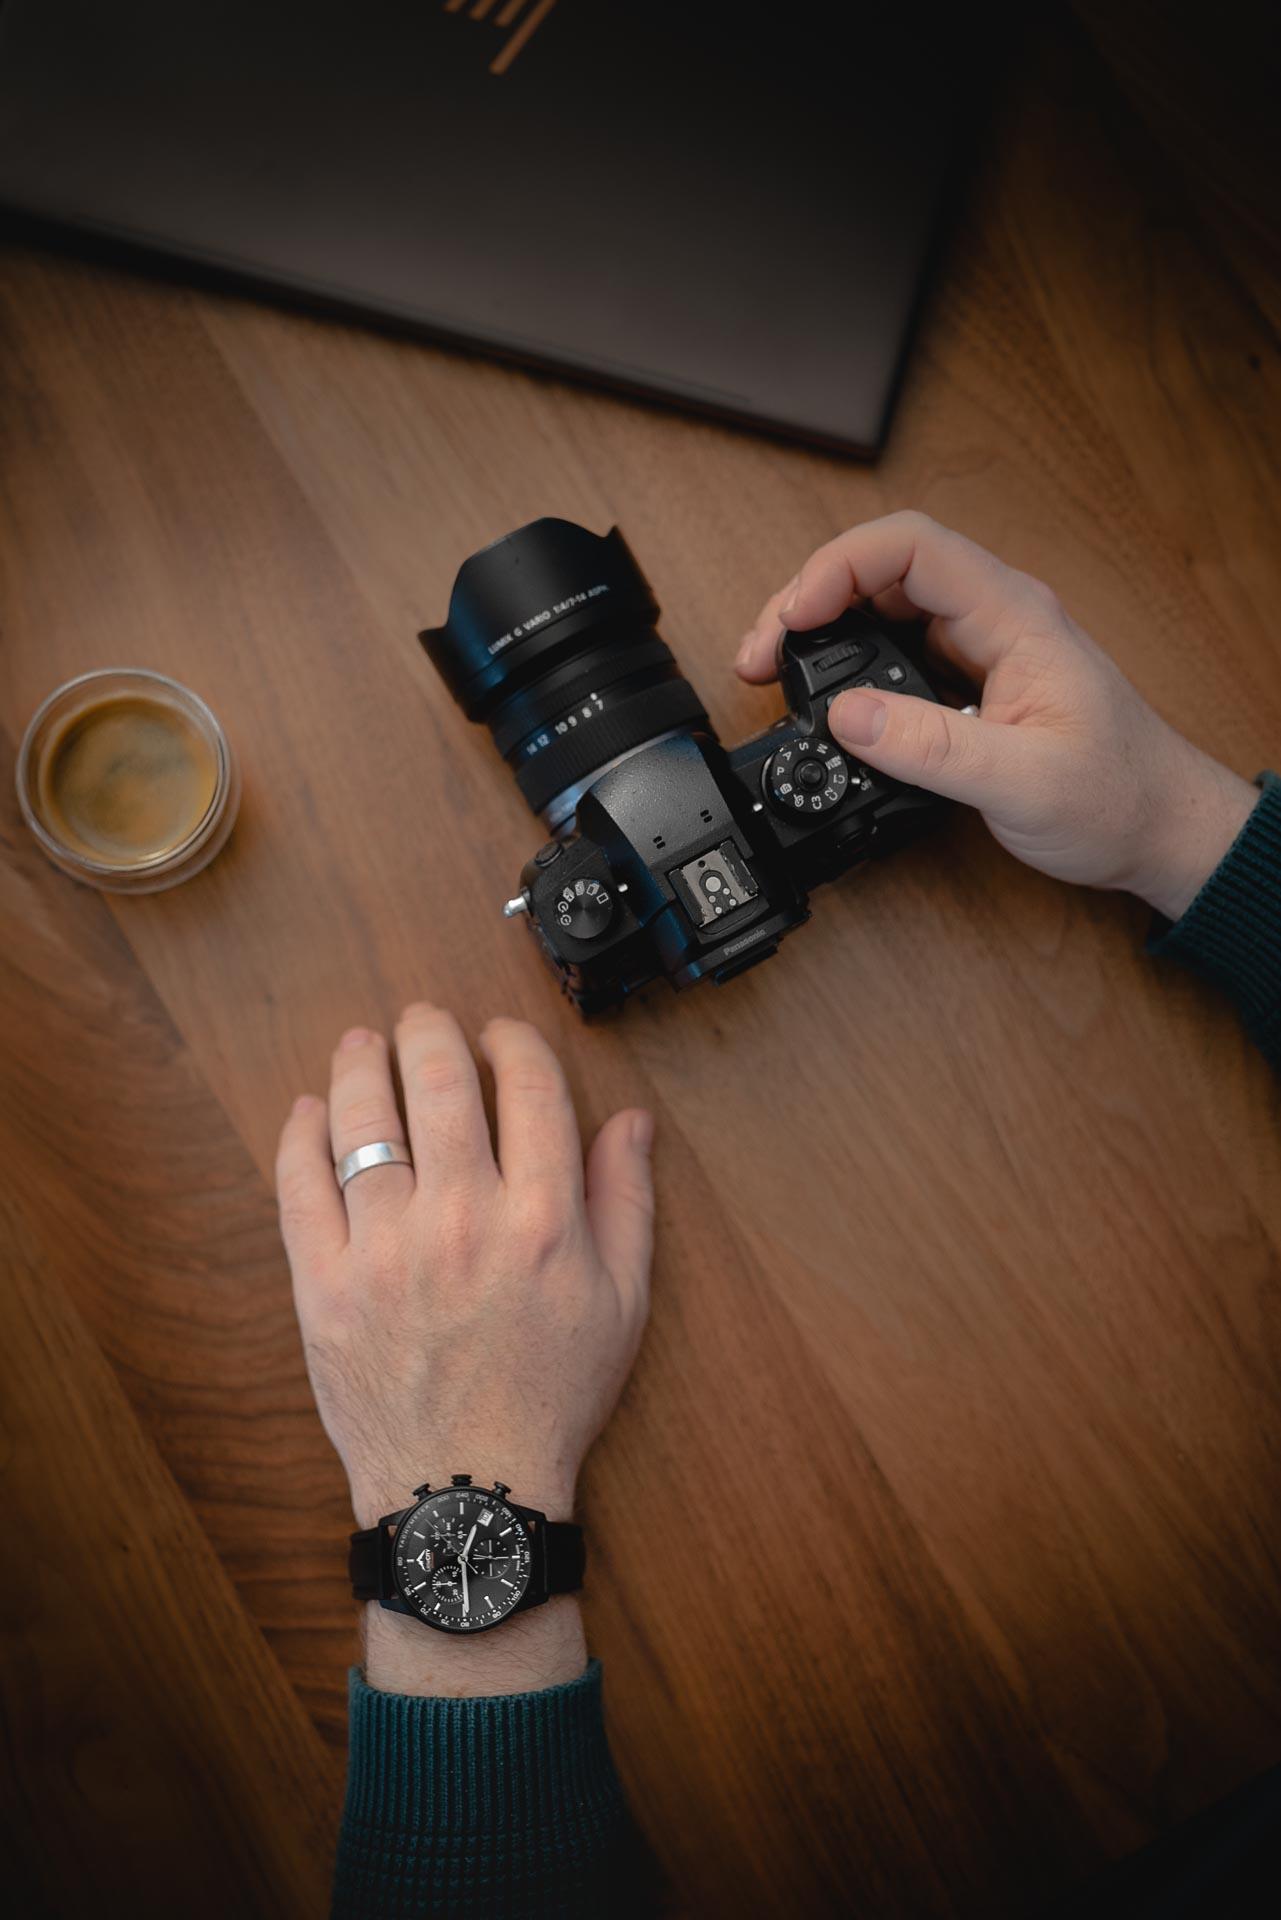 Lifechanger Armband Uhr - Swiss Made